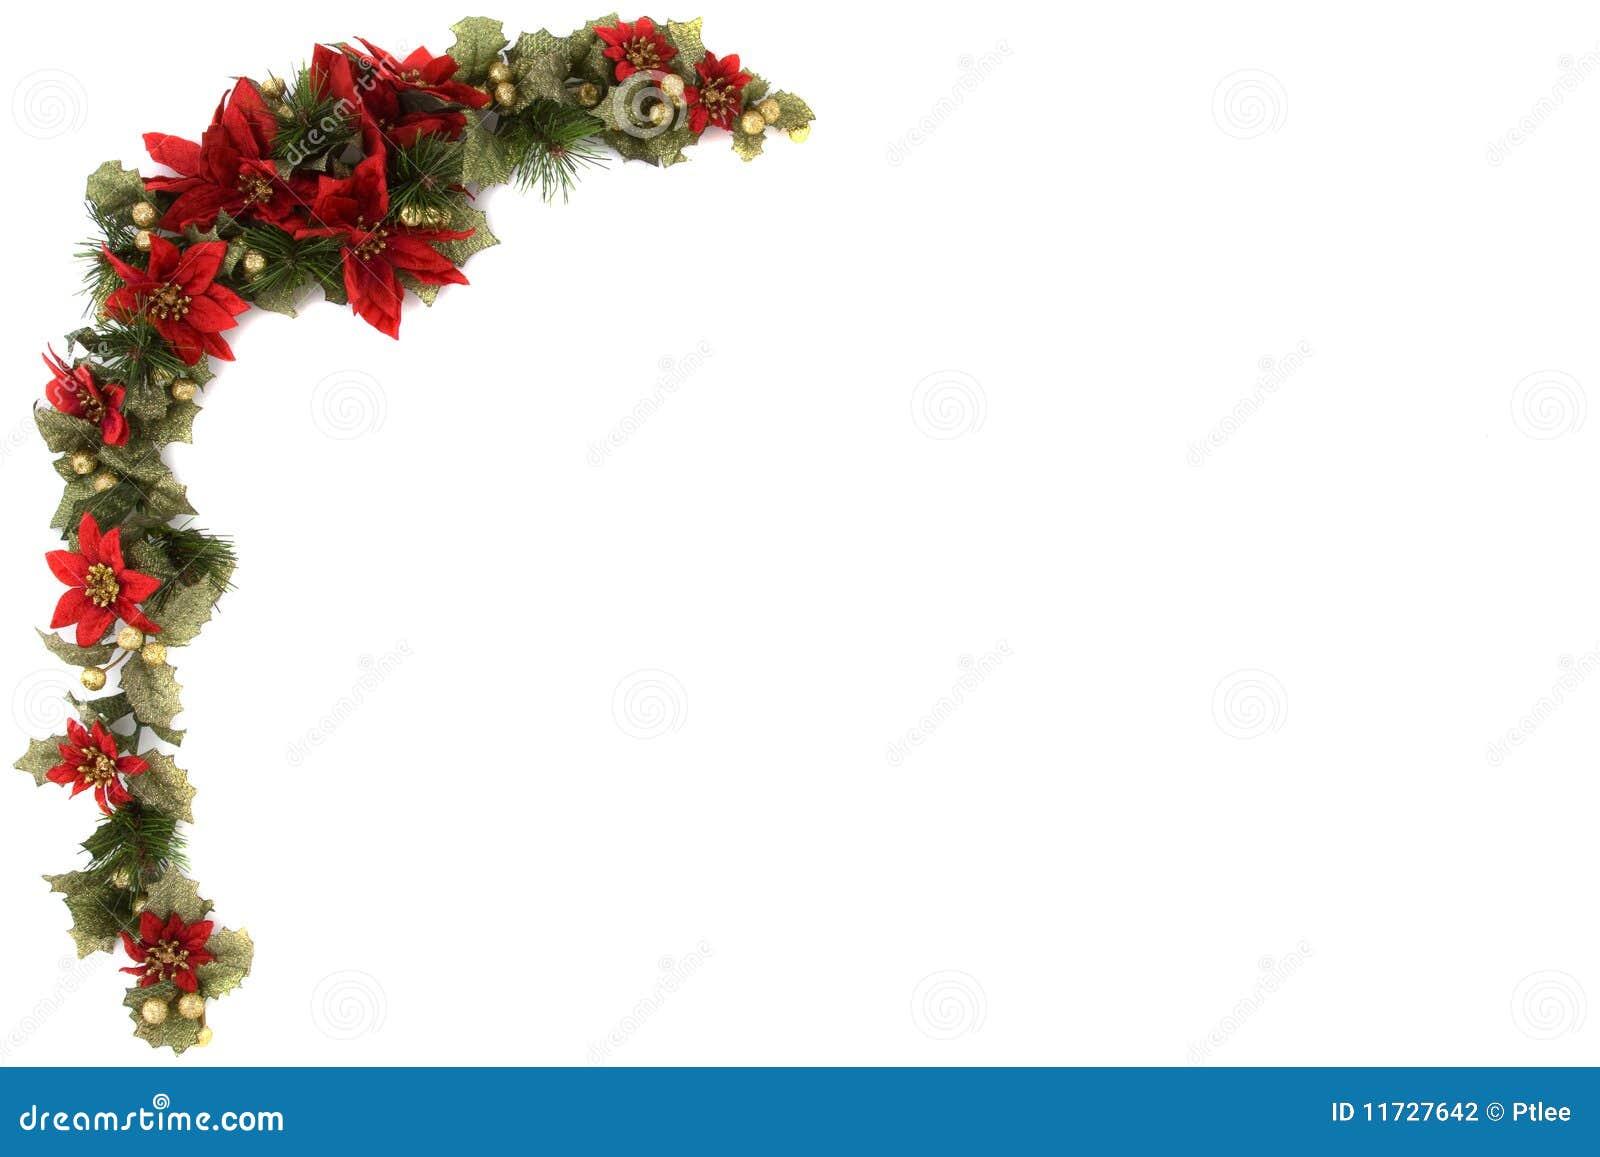 Poinsettia And Christmas Decoration Border Stock Photo ...